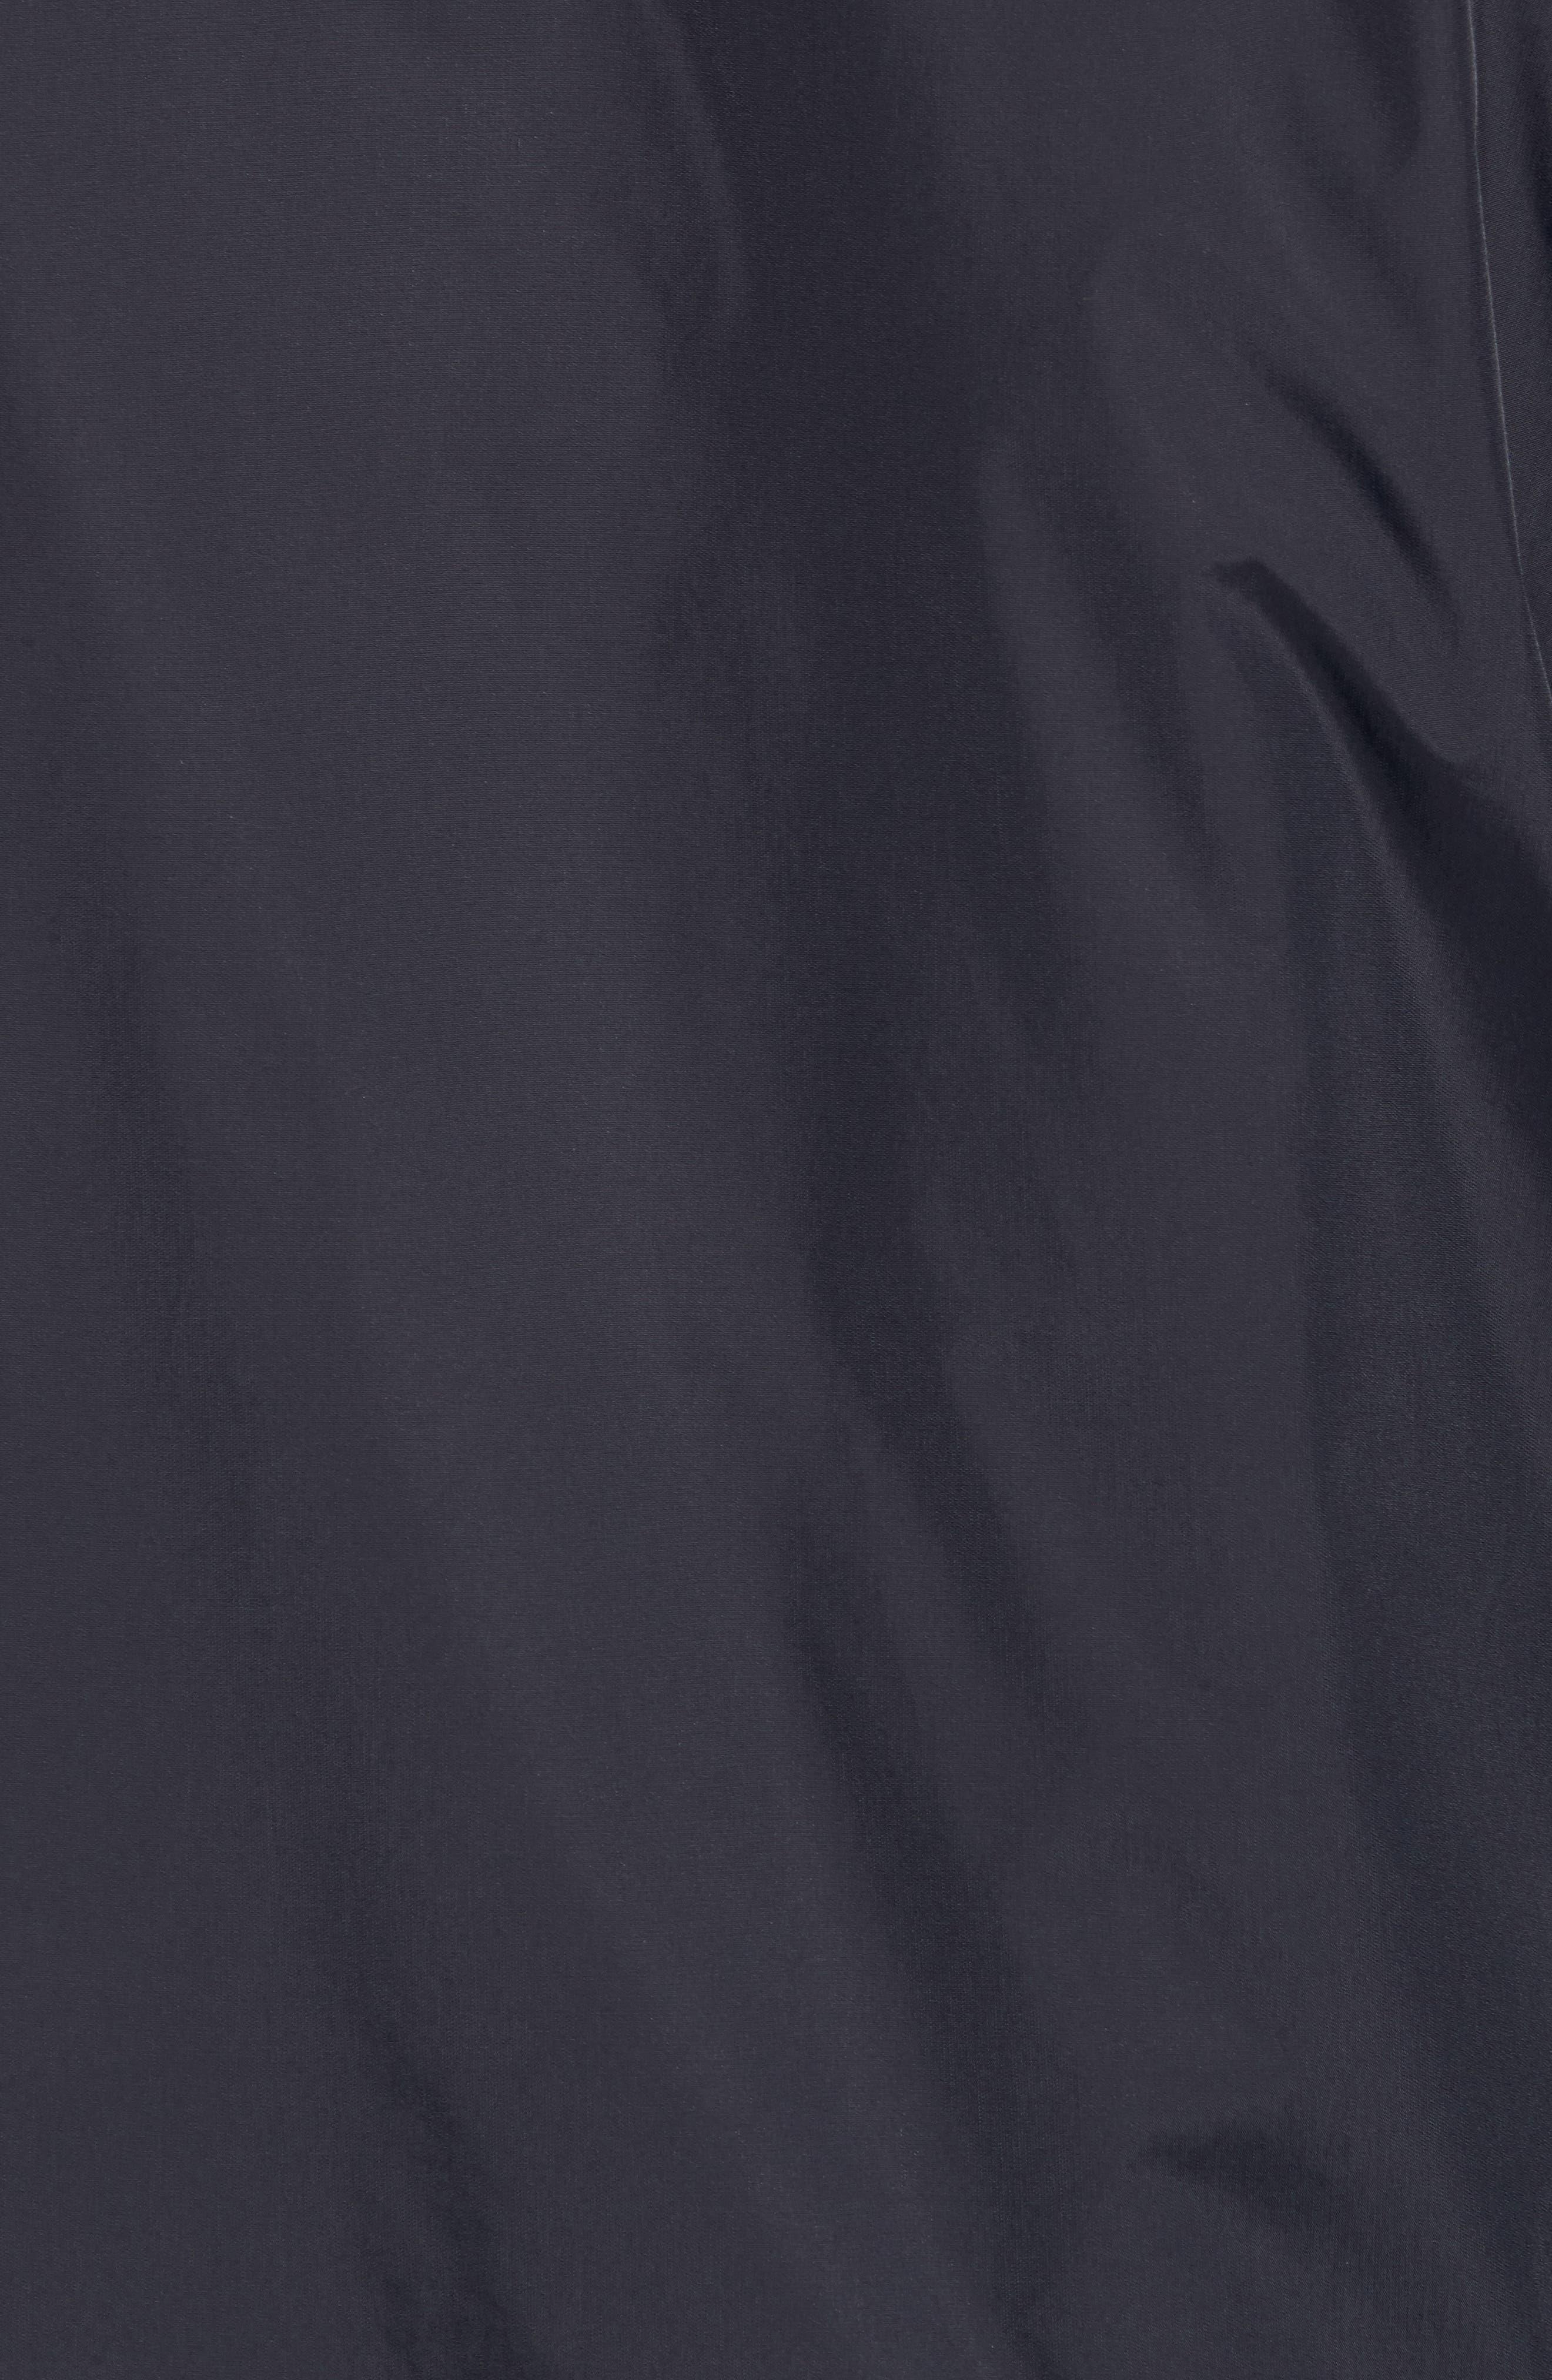 Portland Jacket,                             Alternate thumbnail 16, color,